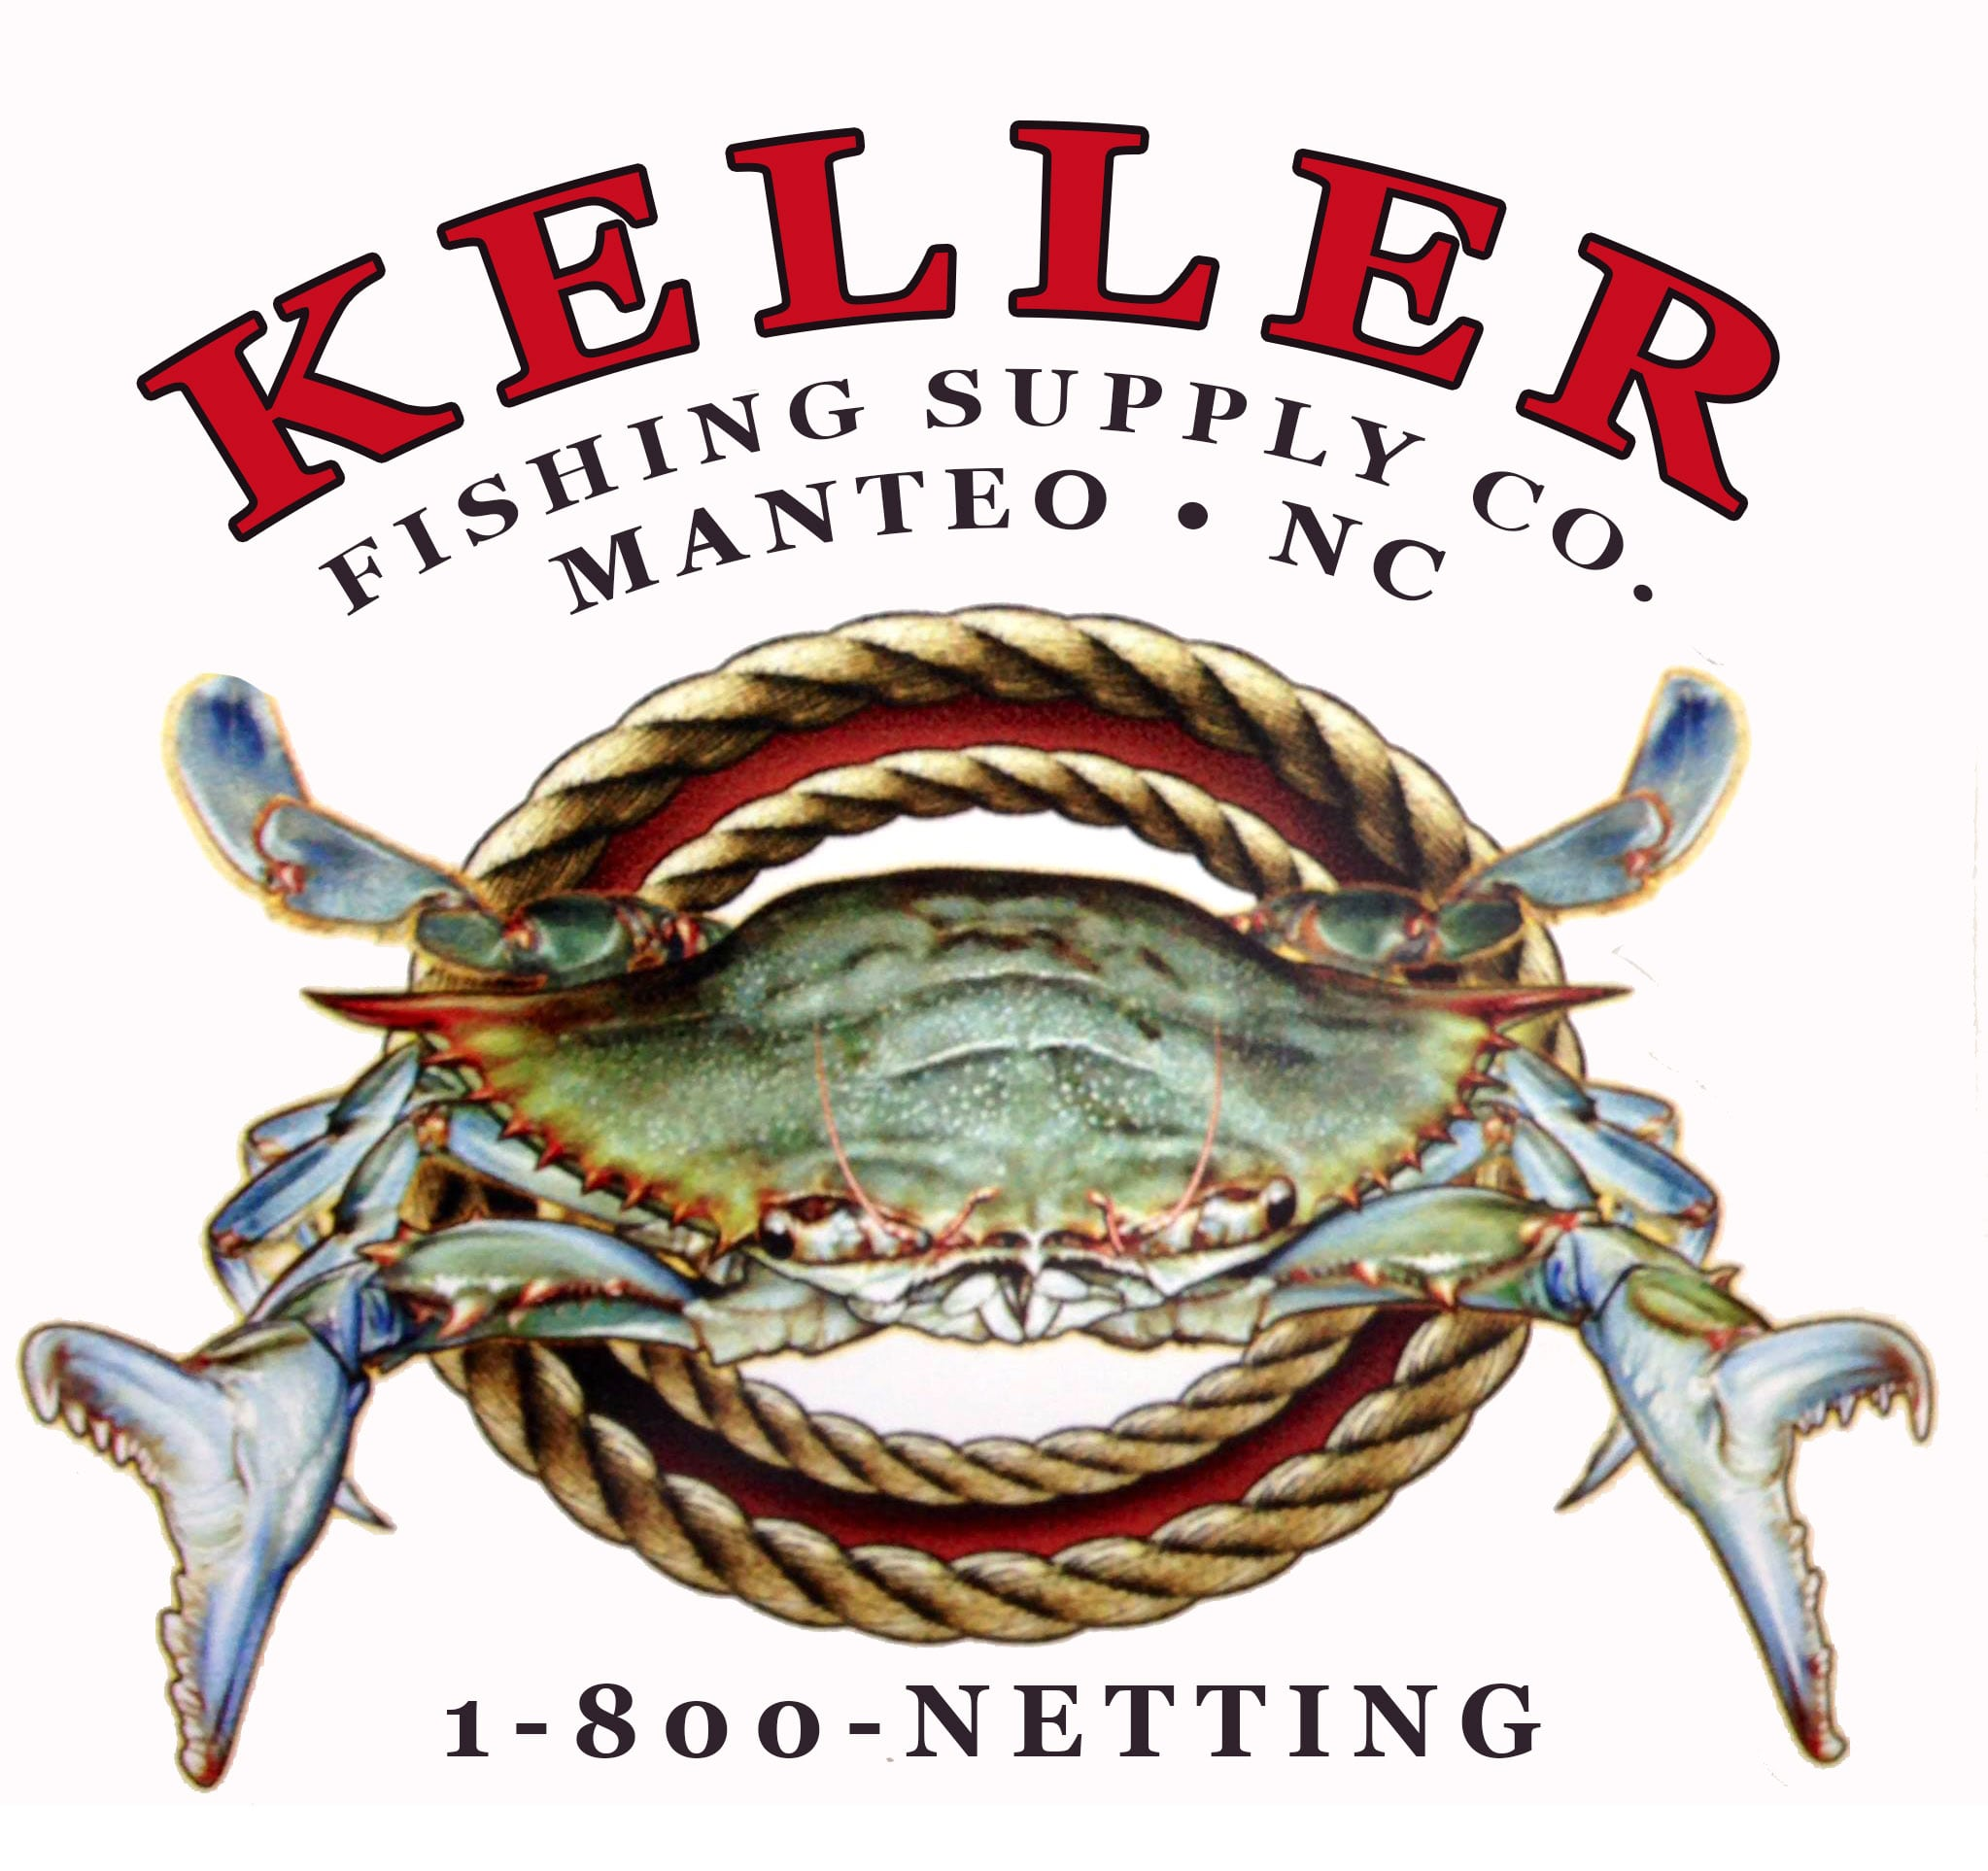 Keller Fishing Supply Company, Manteo, NC, logo